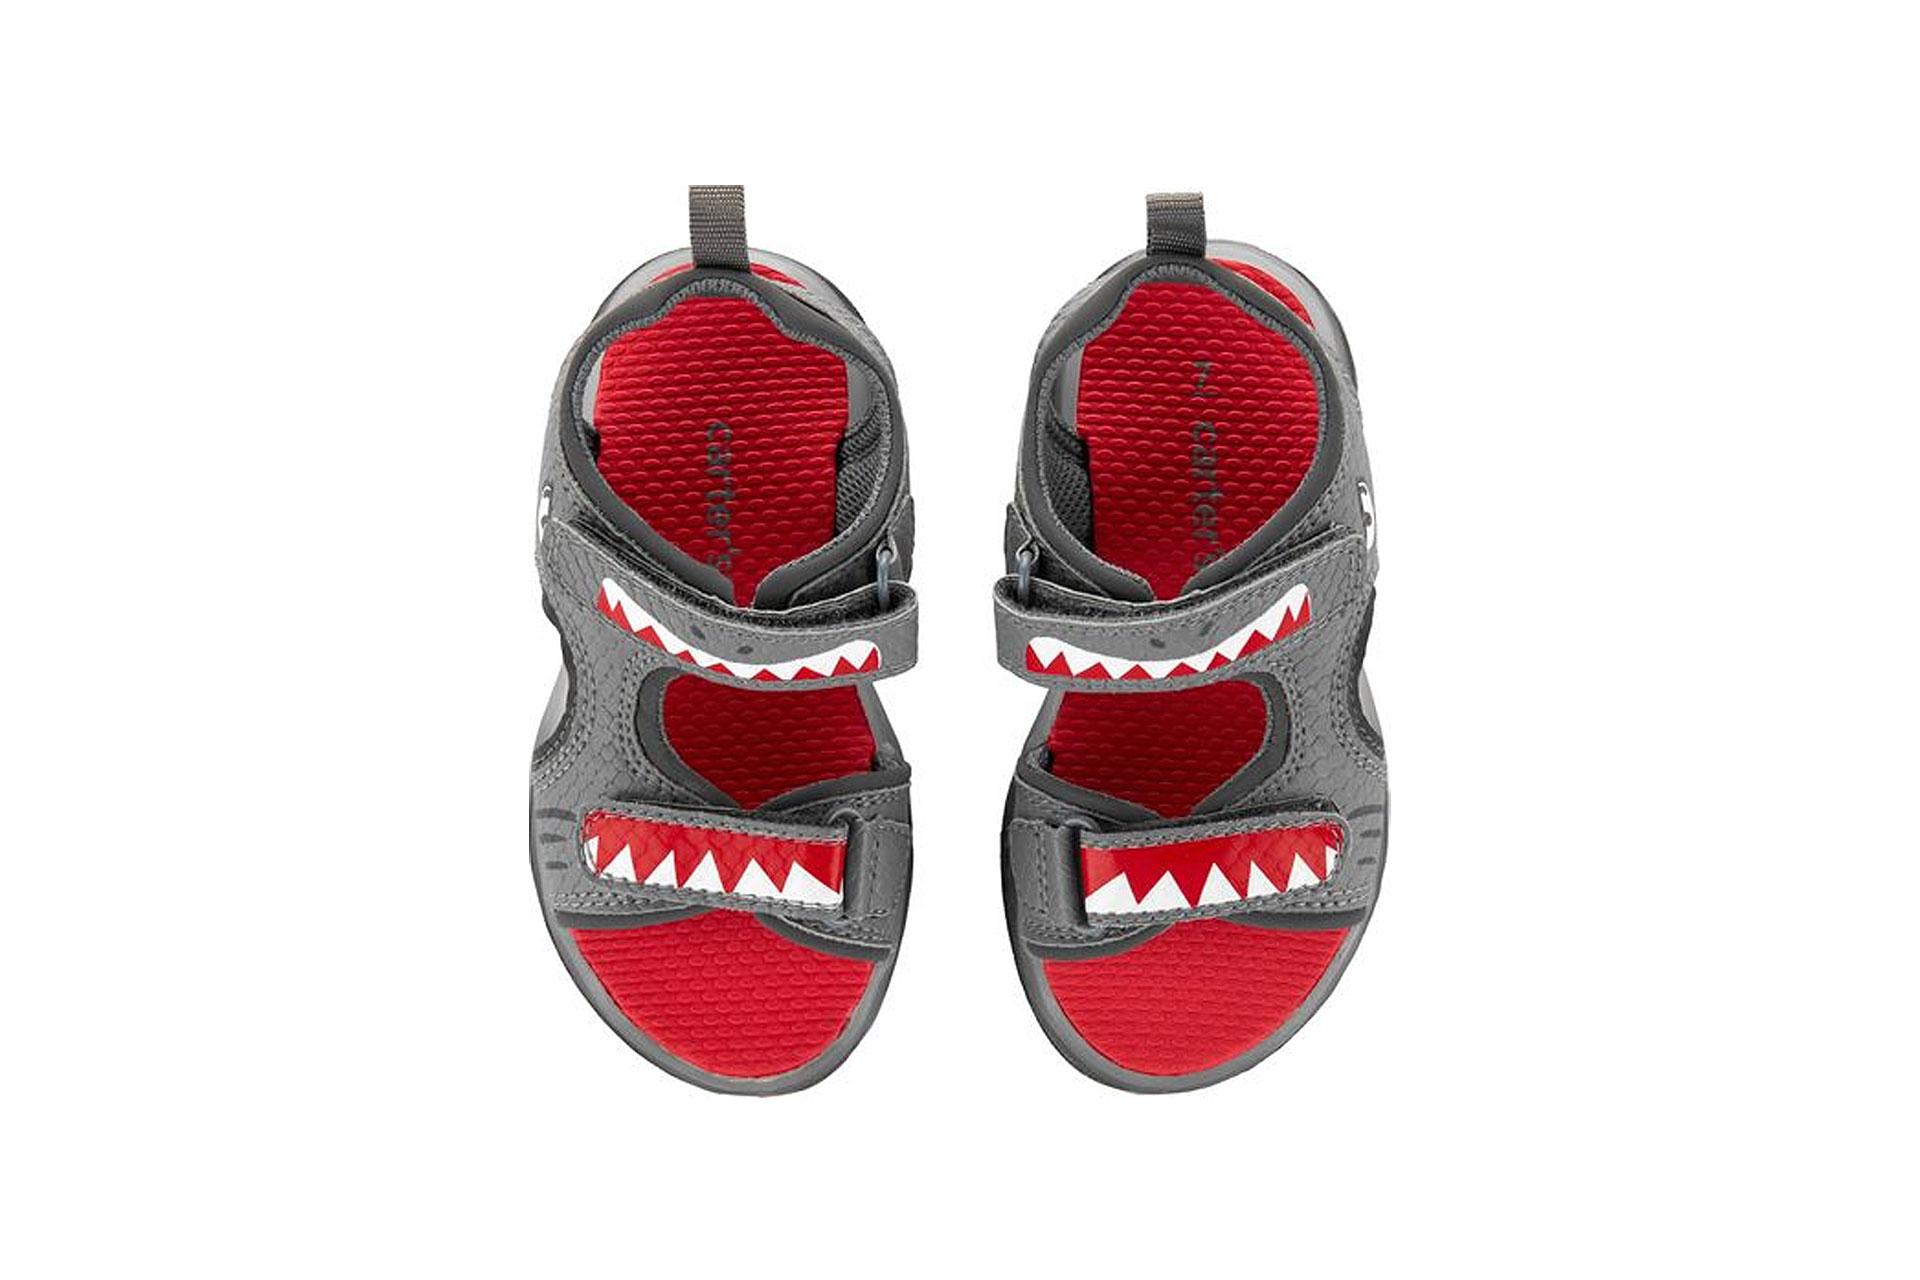 Carter's Light-Up Shark Sandals; Courtesy of Carter's